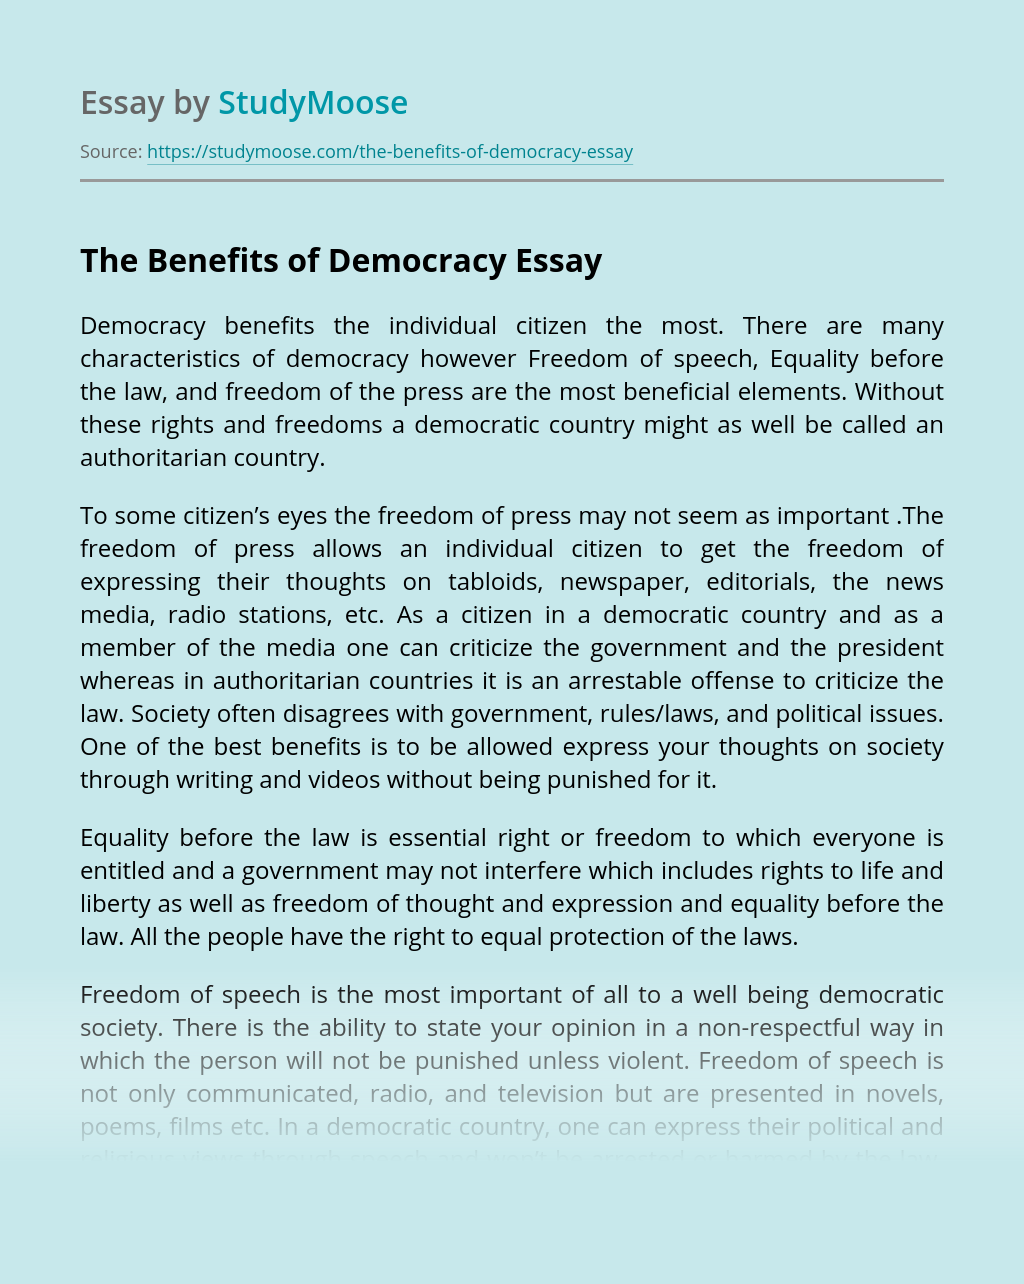 The Benefits of Democracy